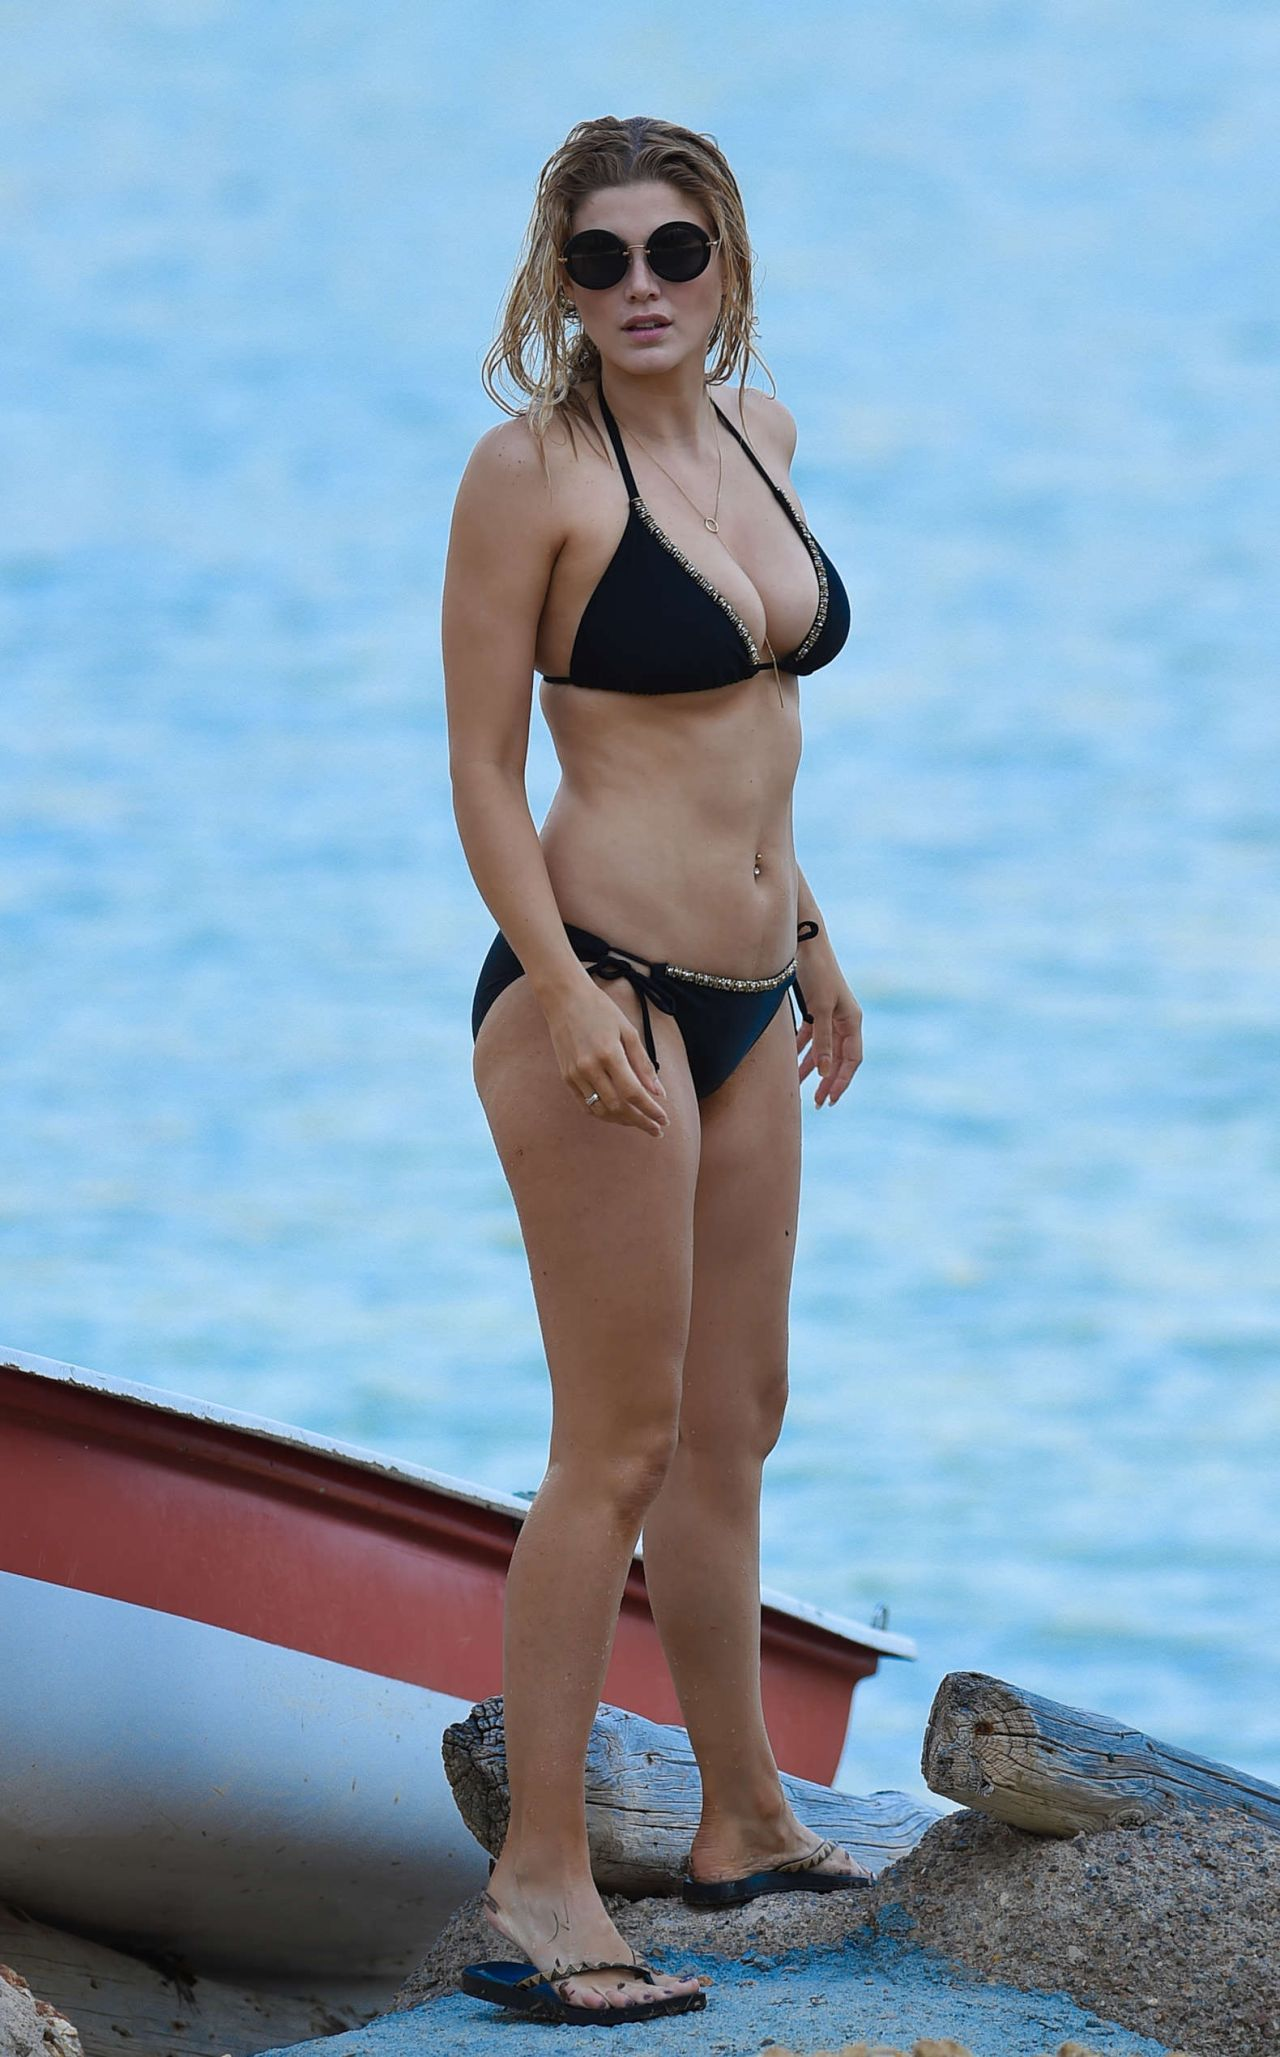 Ashley James In Black Bikini At A Beach In Bali 1 2 2016